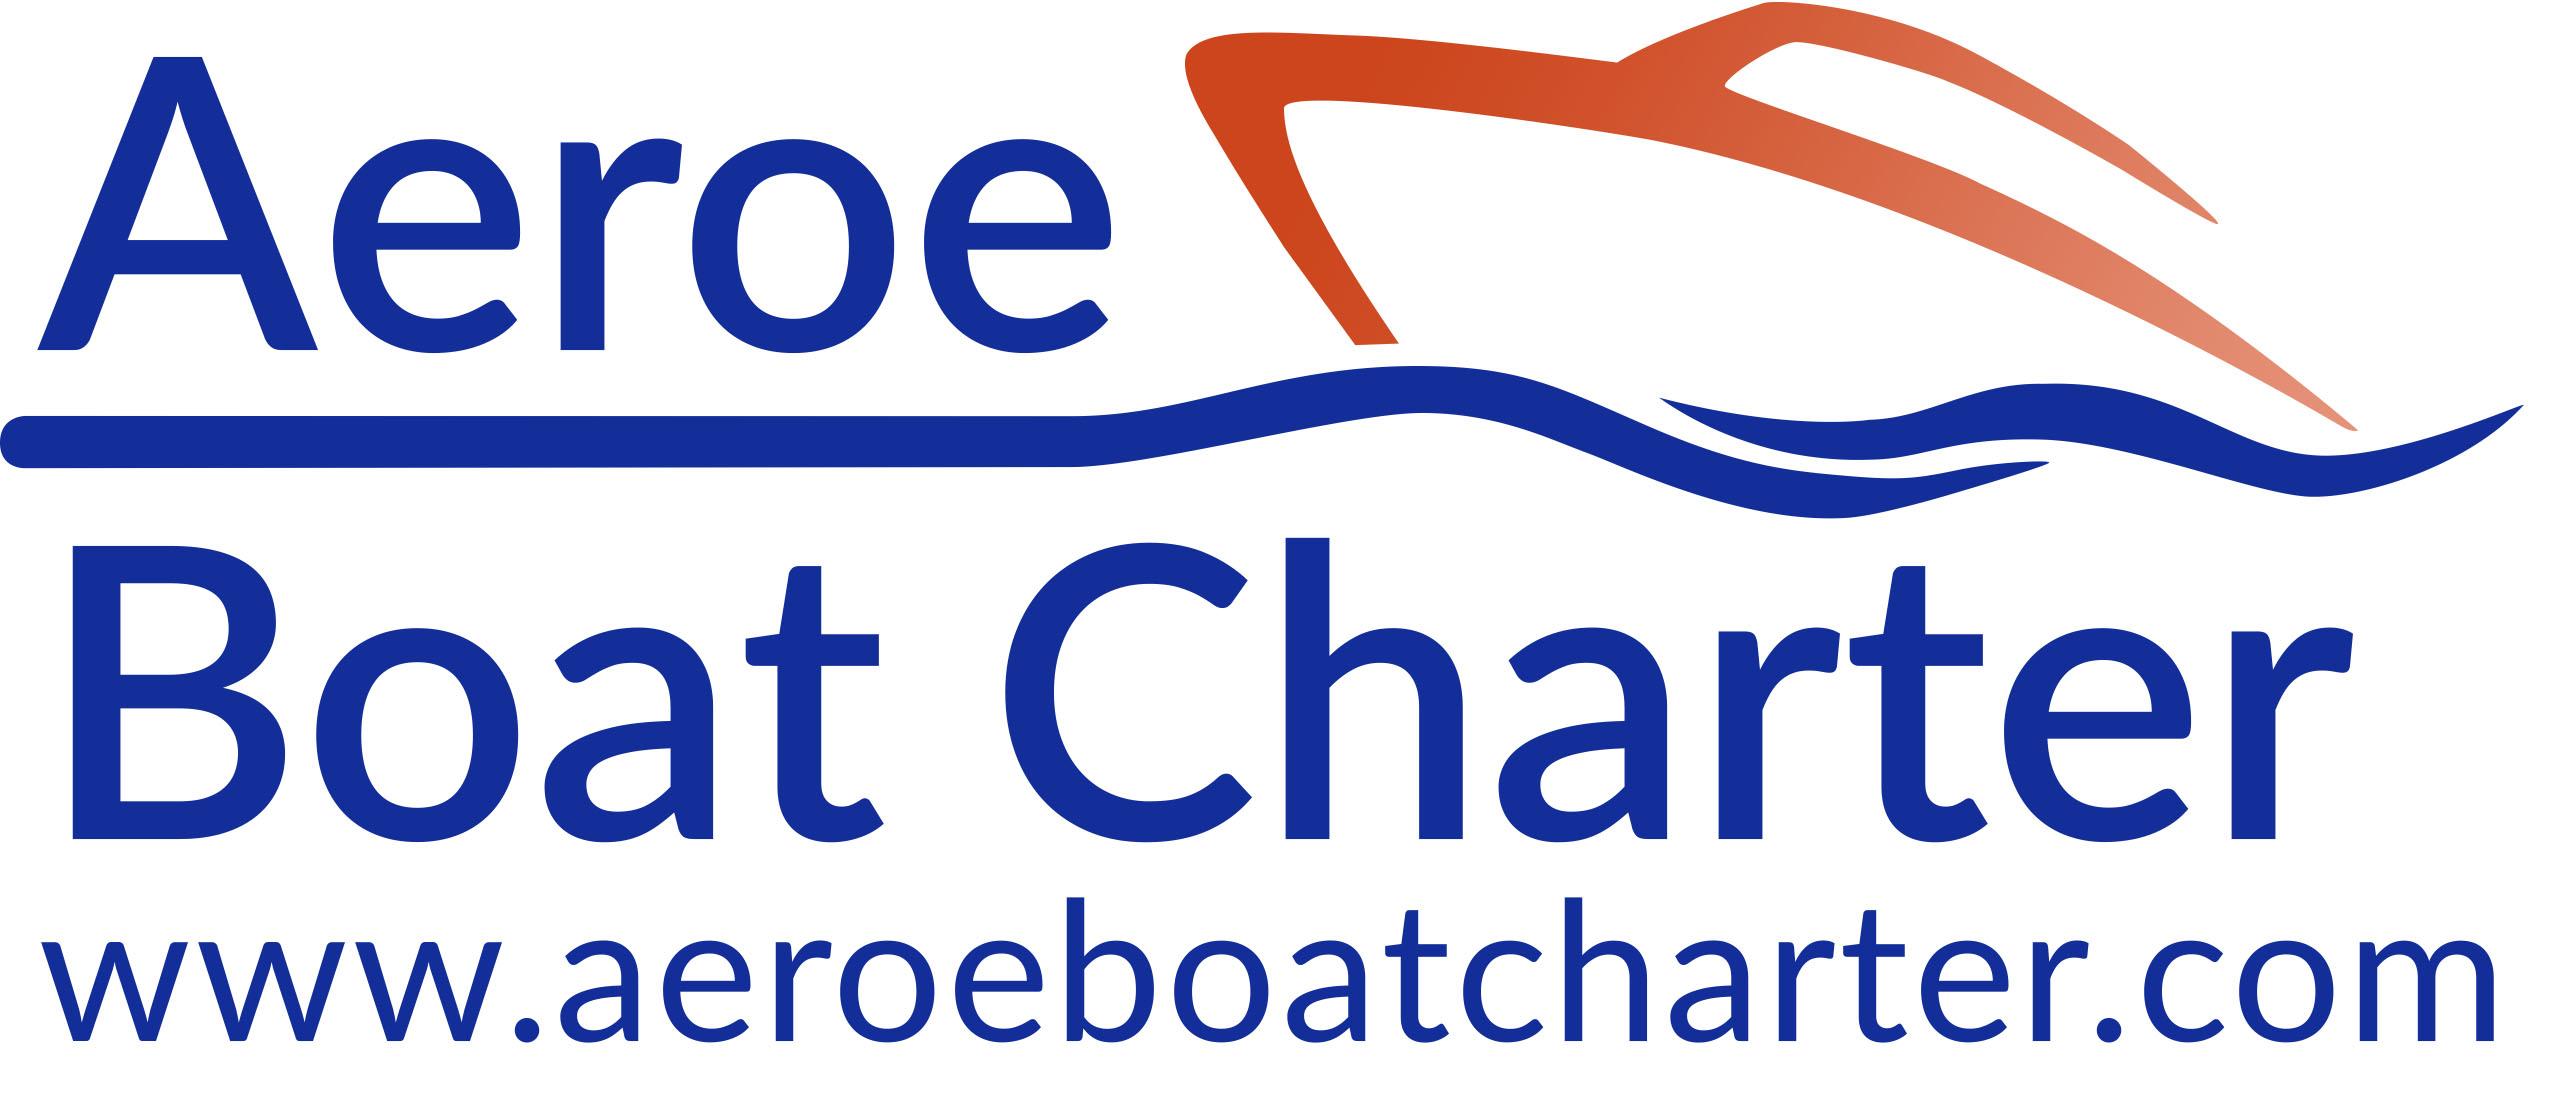 AeroeBC logo